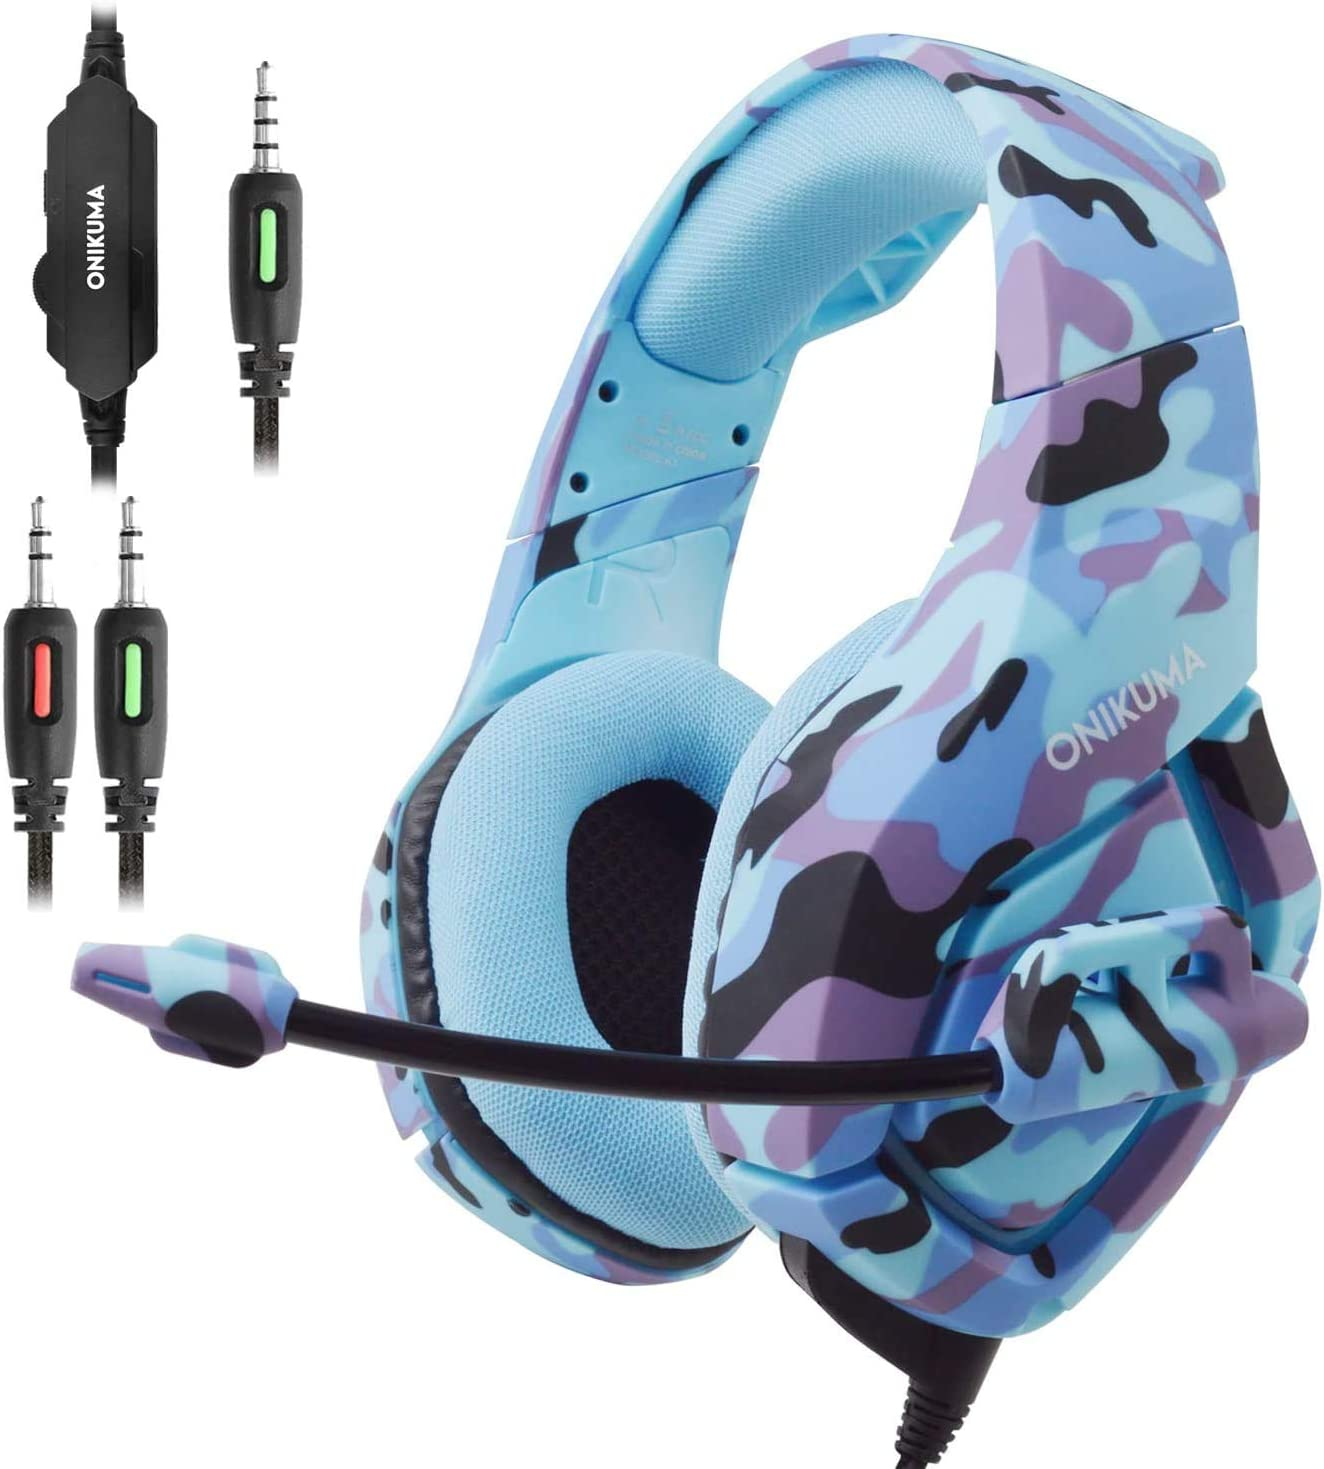 PS4 Gaming Headset, ANRIS Gaming Headphone, Professional 3.5mm Over Ear Gamer Headphones (Blue)